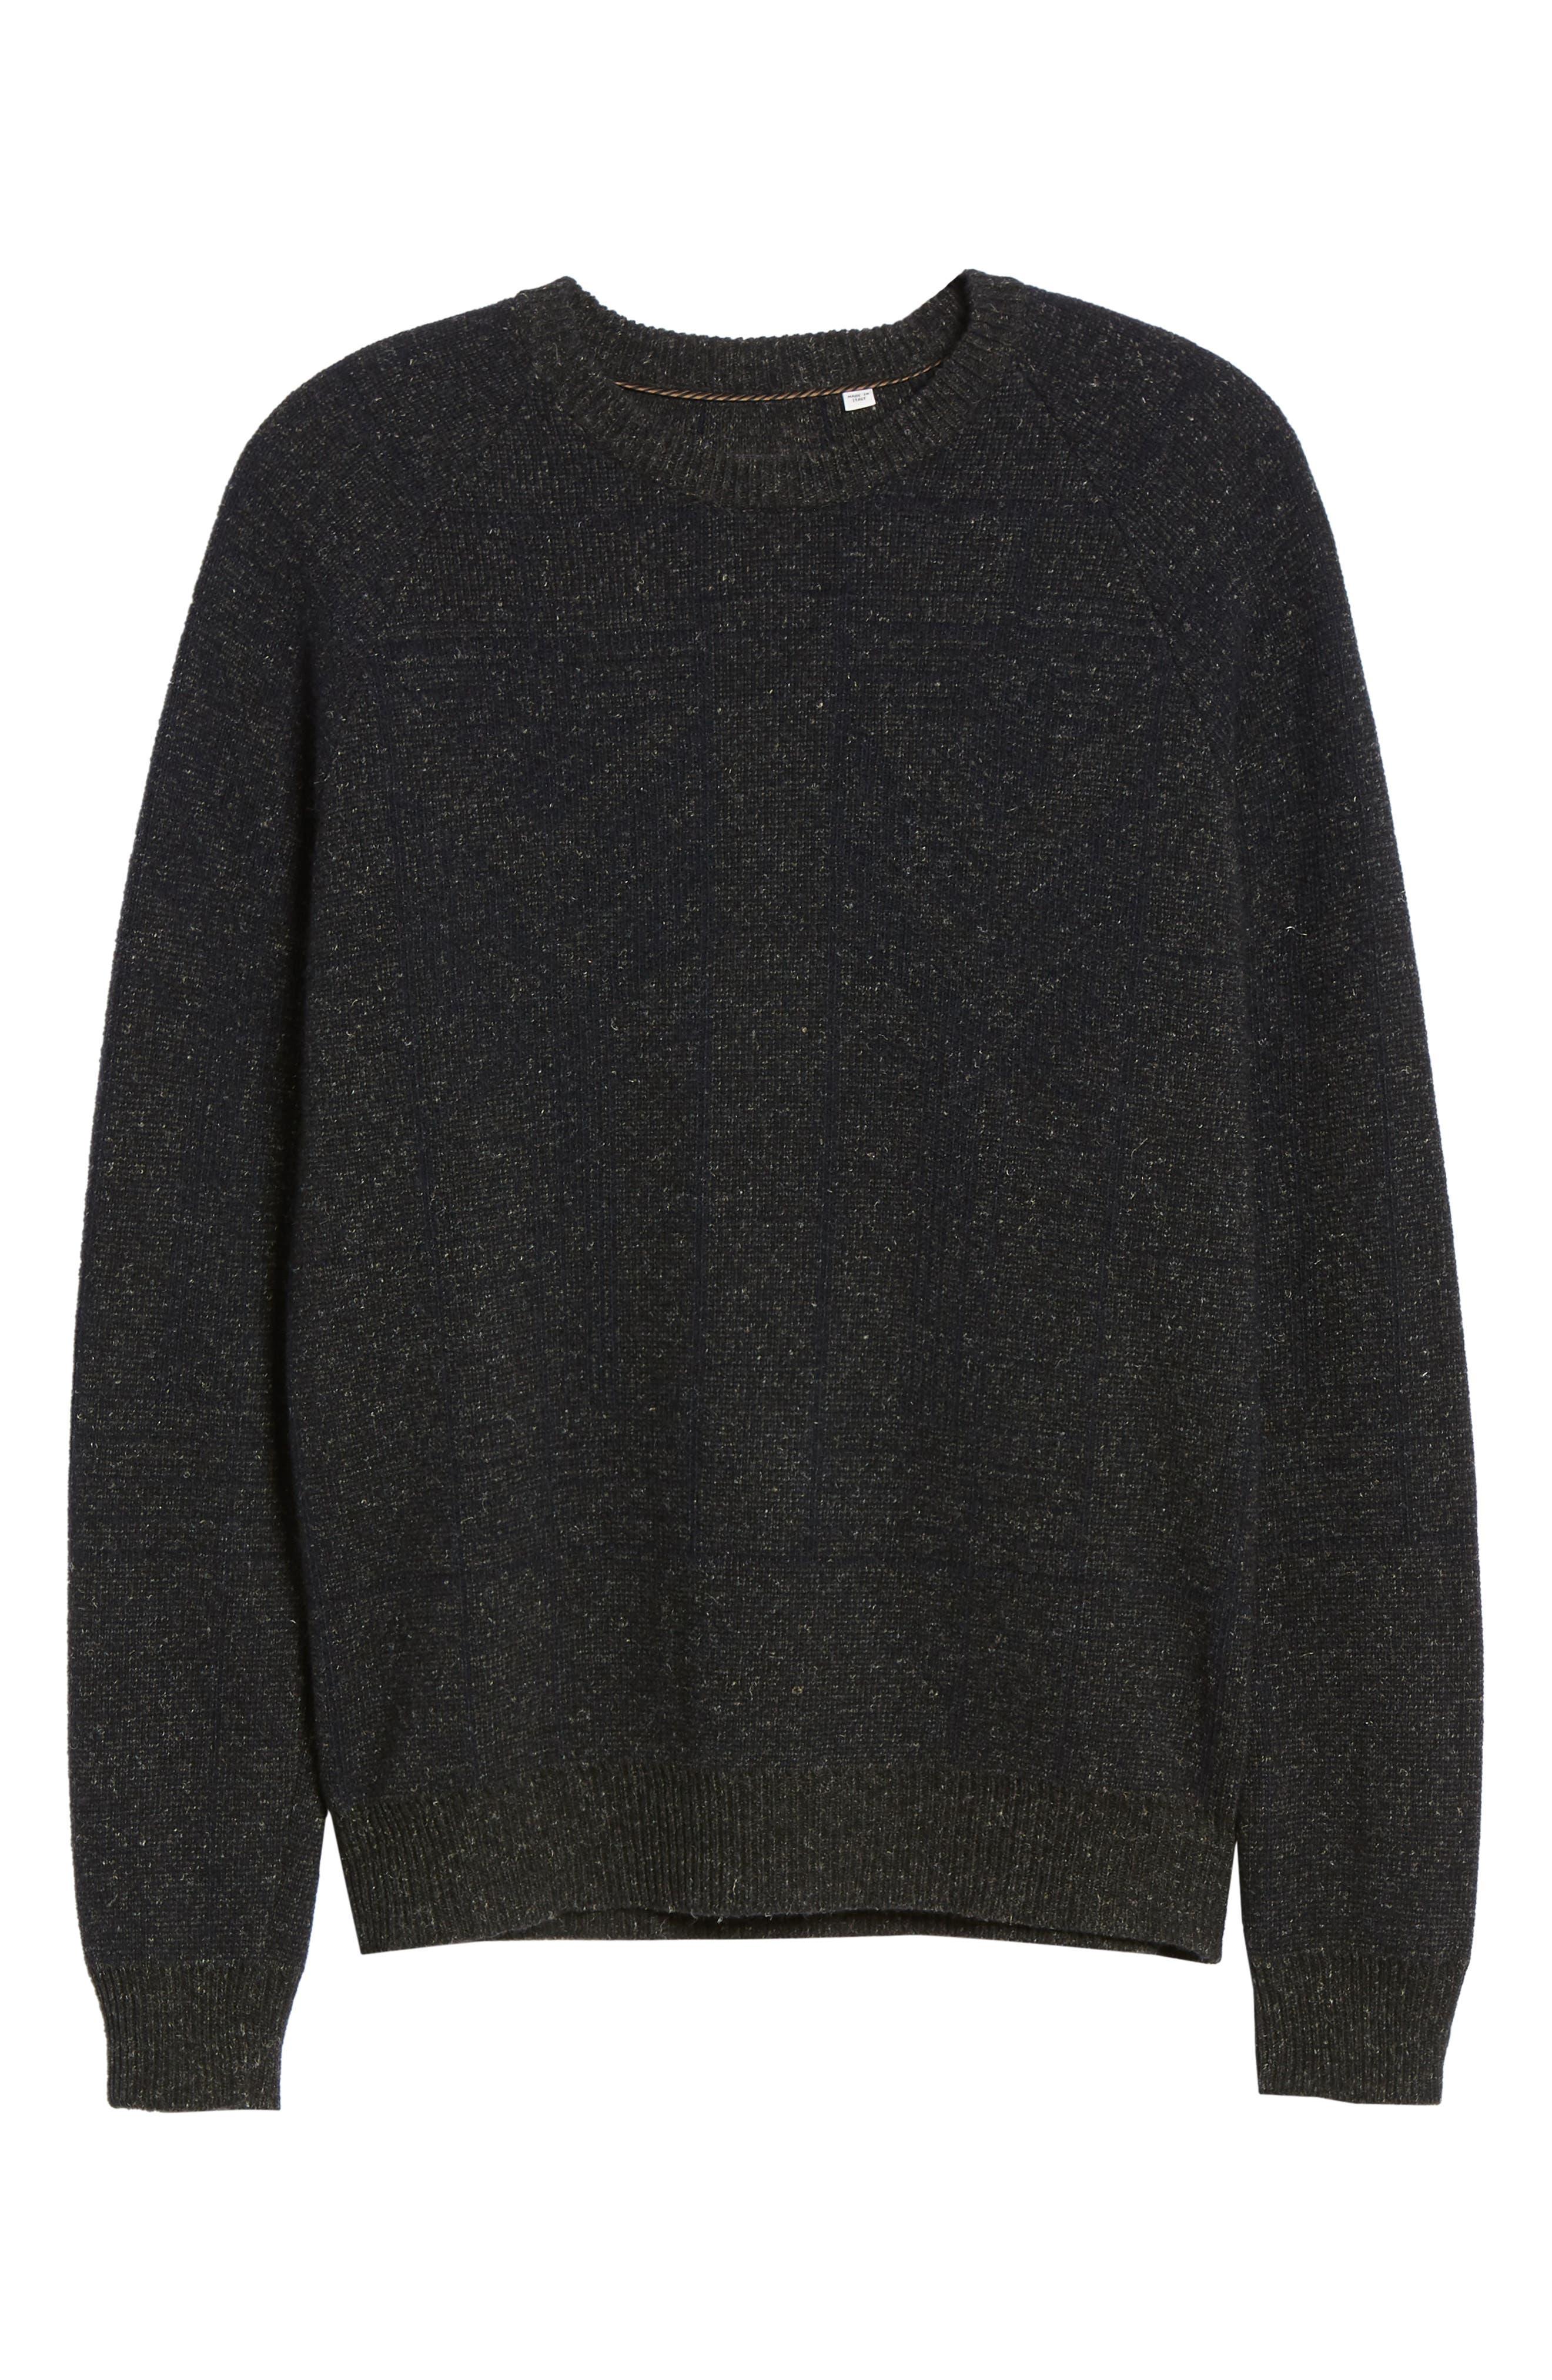 Regular Fit Crewneck Sweater,                             Alternate thumbnail 6, color,                             CHARCOAL